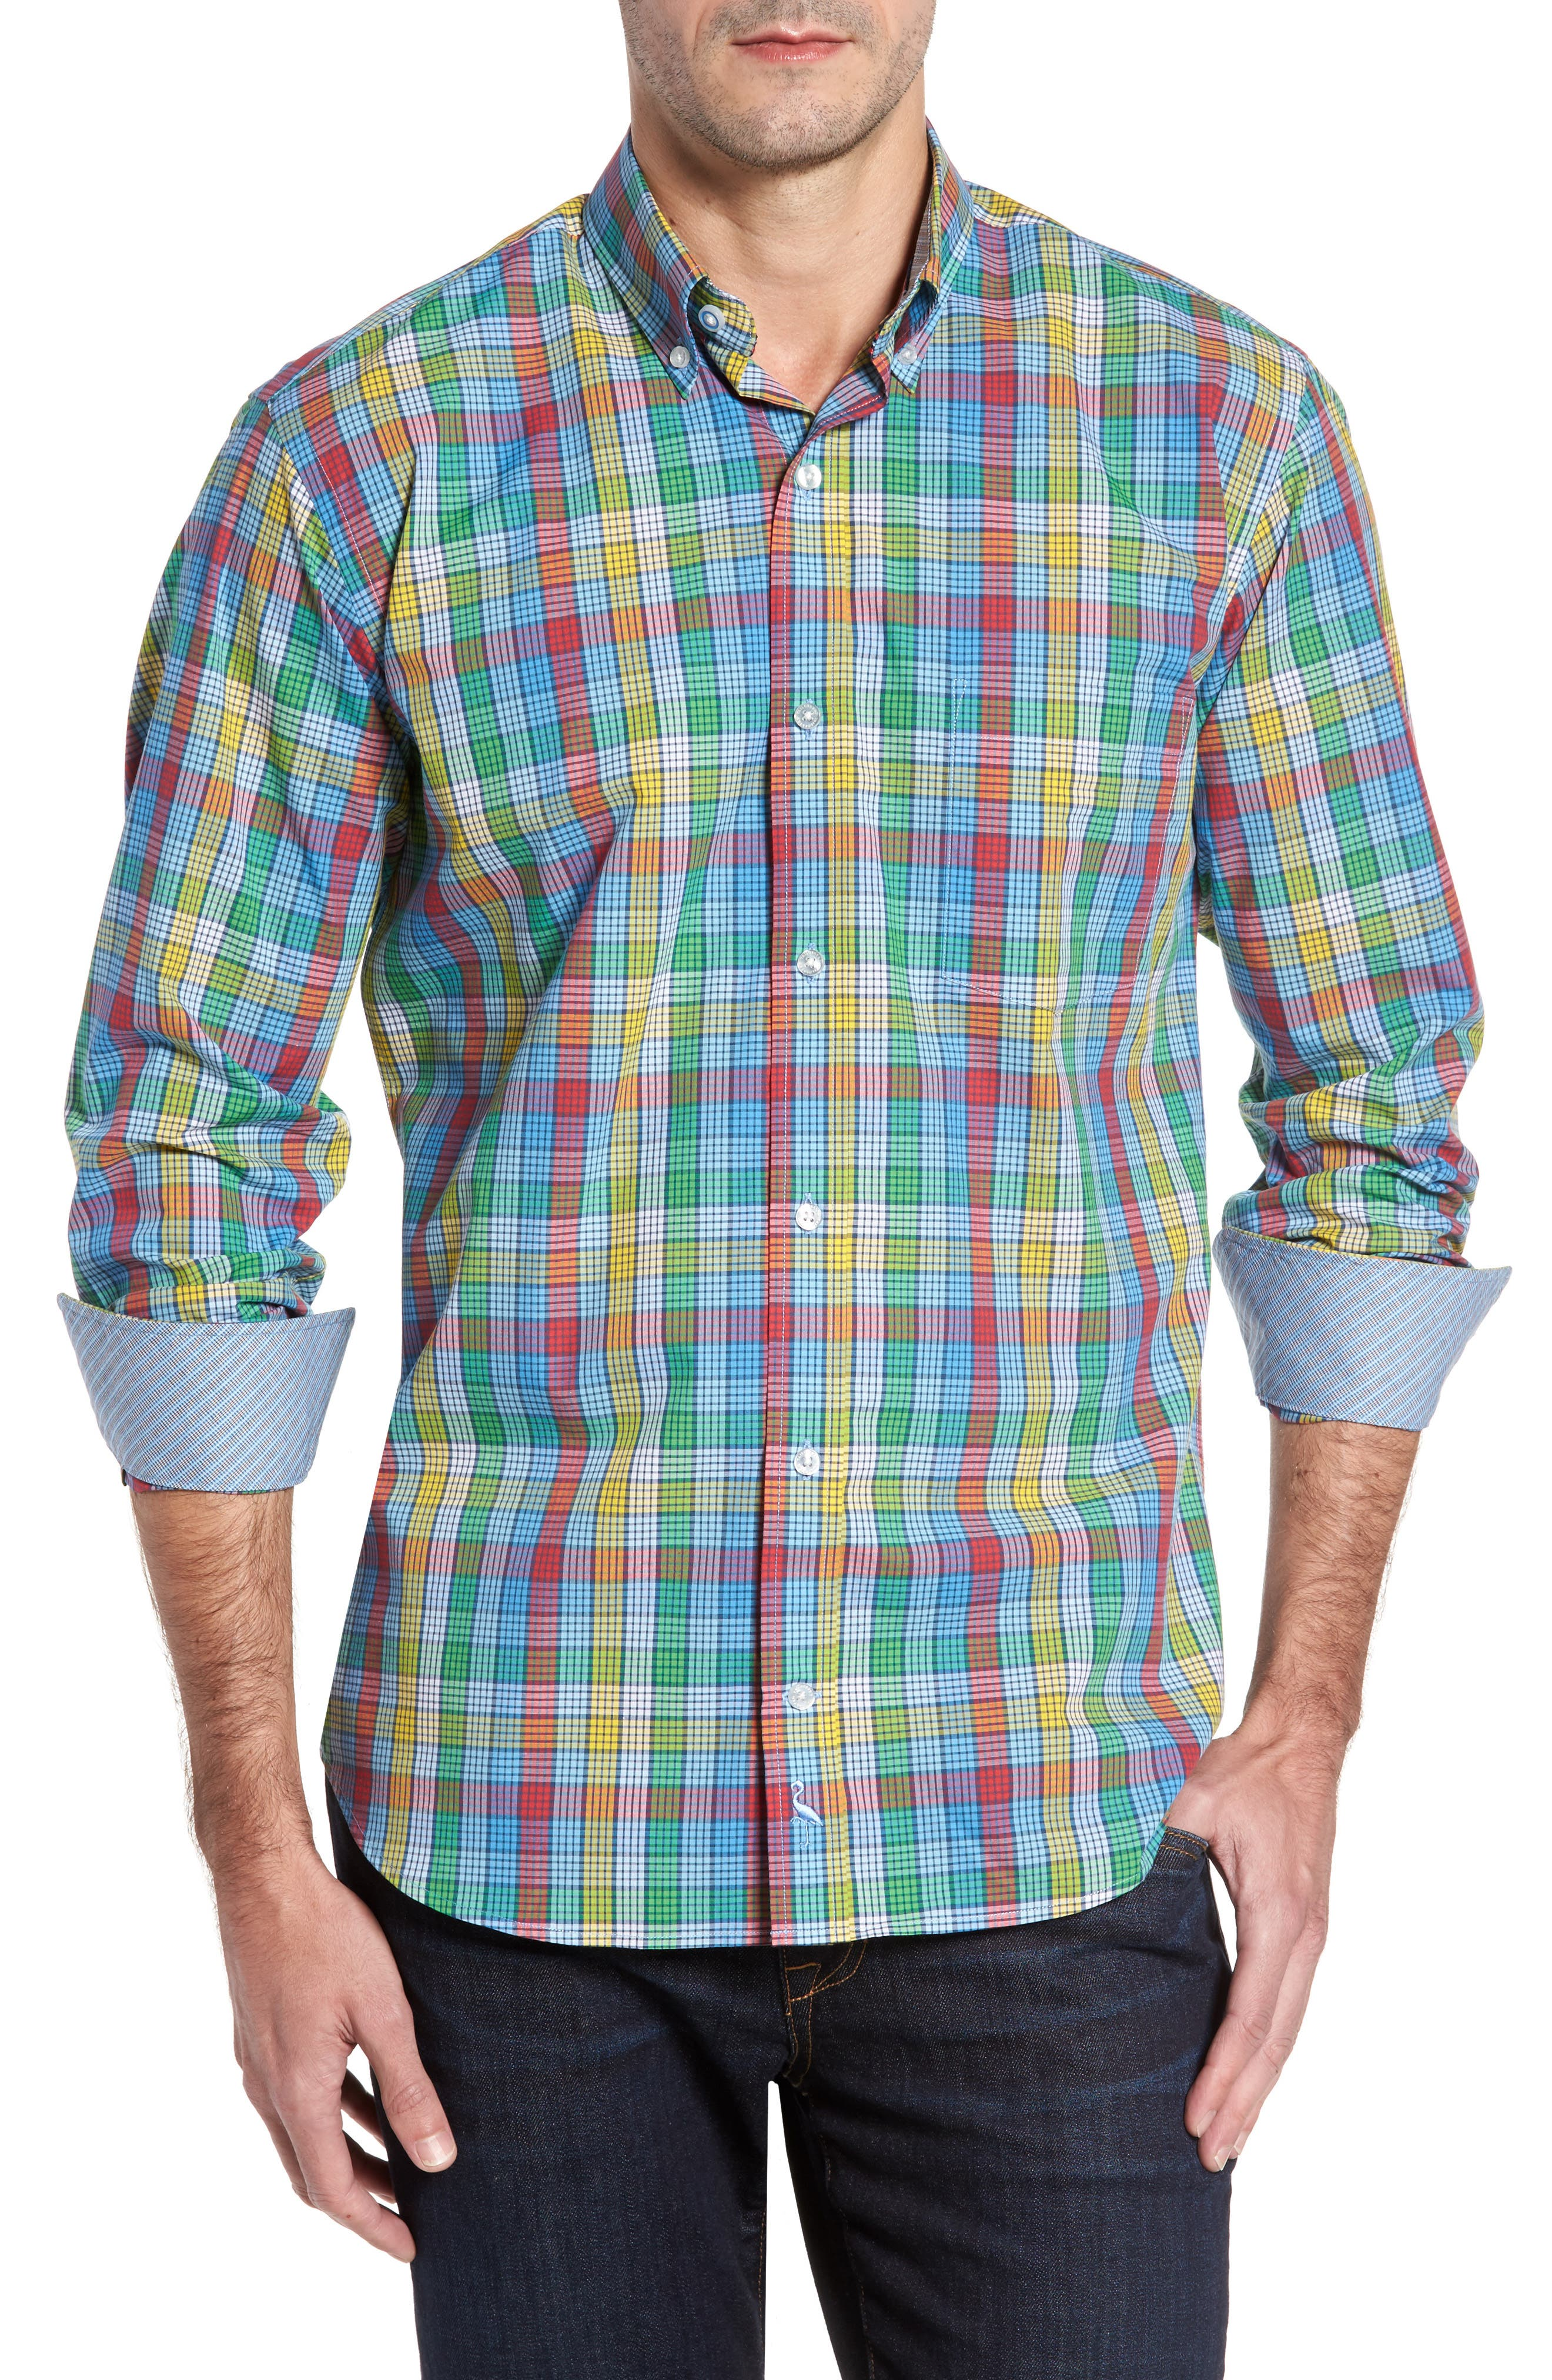 Alternate Image 1 Selected - TailorByrd Belmont Check Sport Shirt